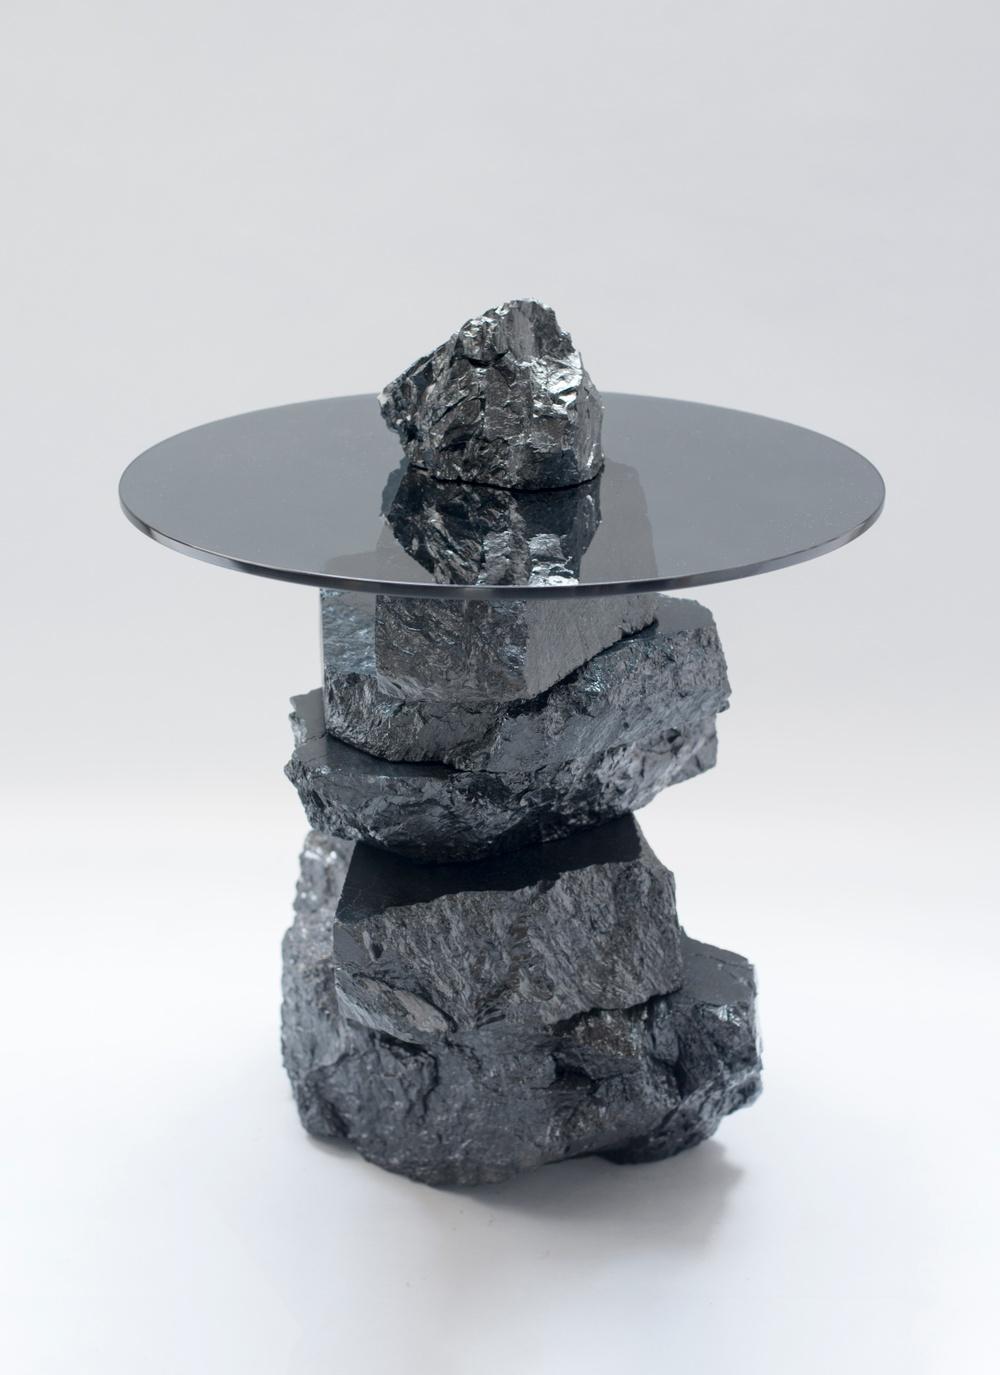 Designer: Jesper Eriksson, Coal: Post-Fuel. Cred: Jesper Eriksson.